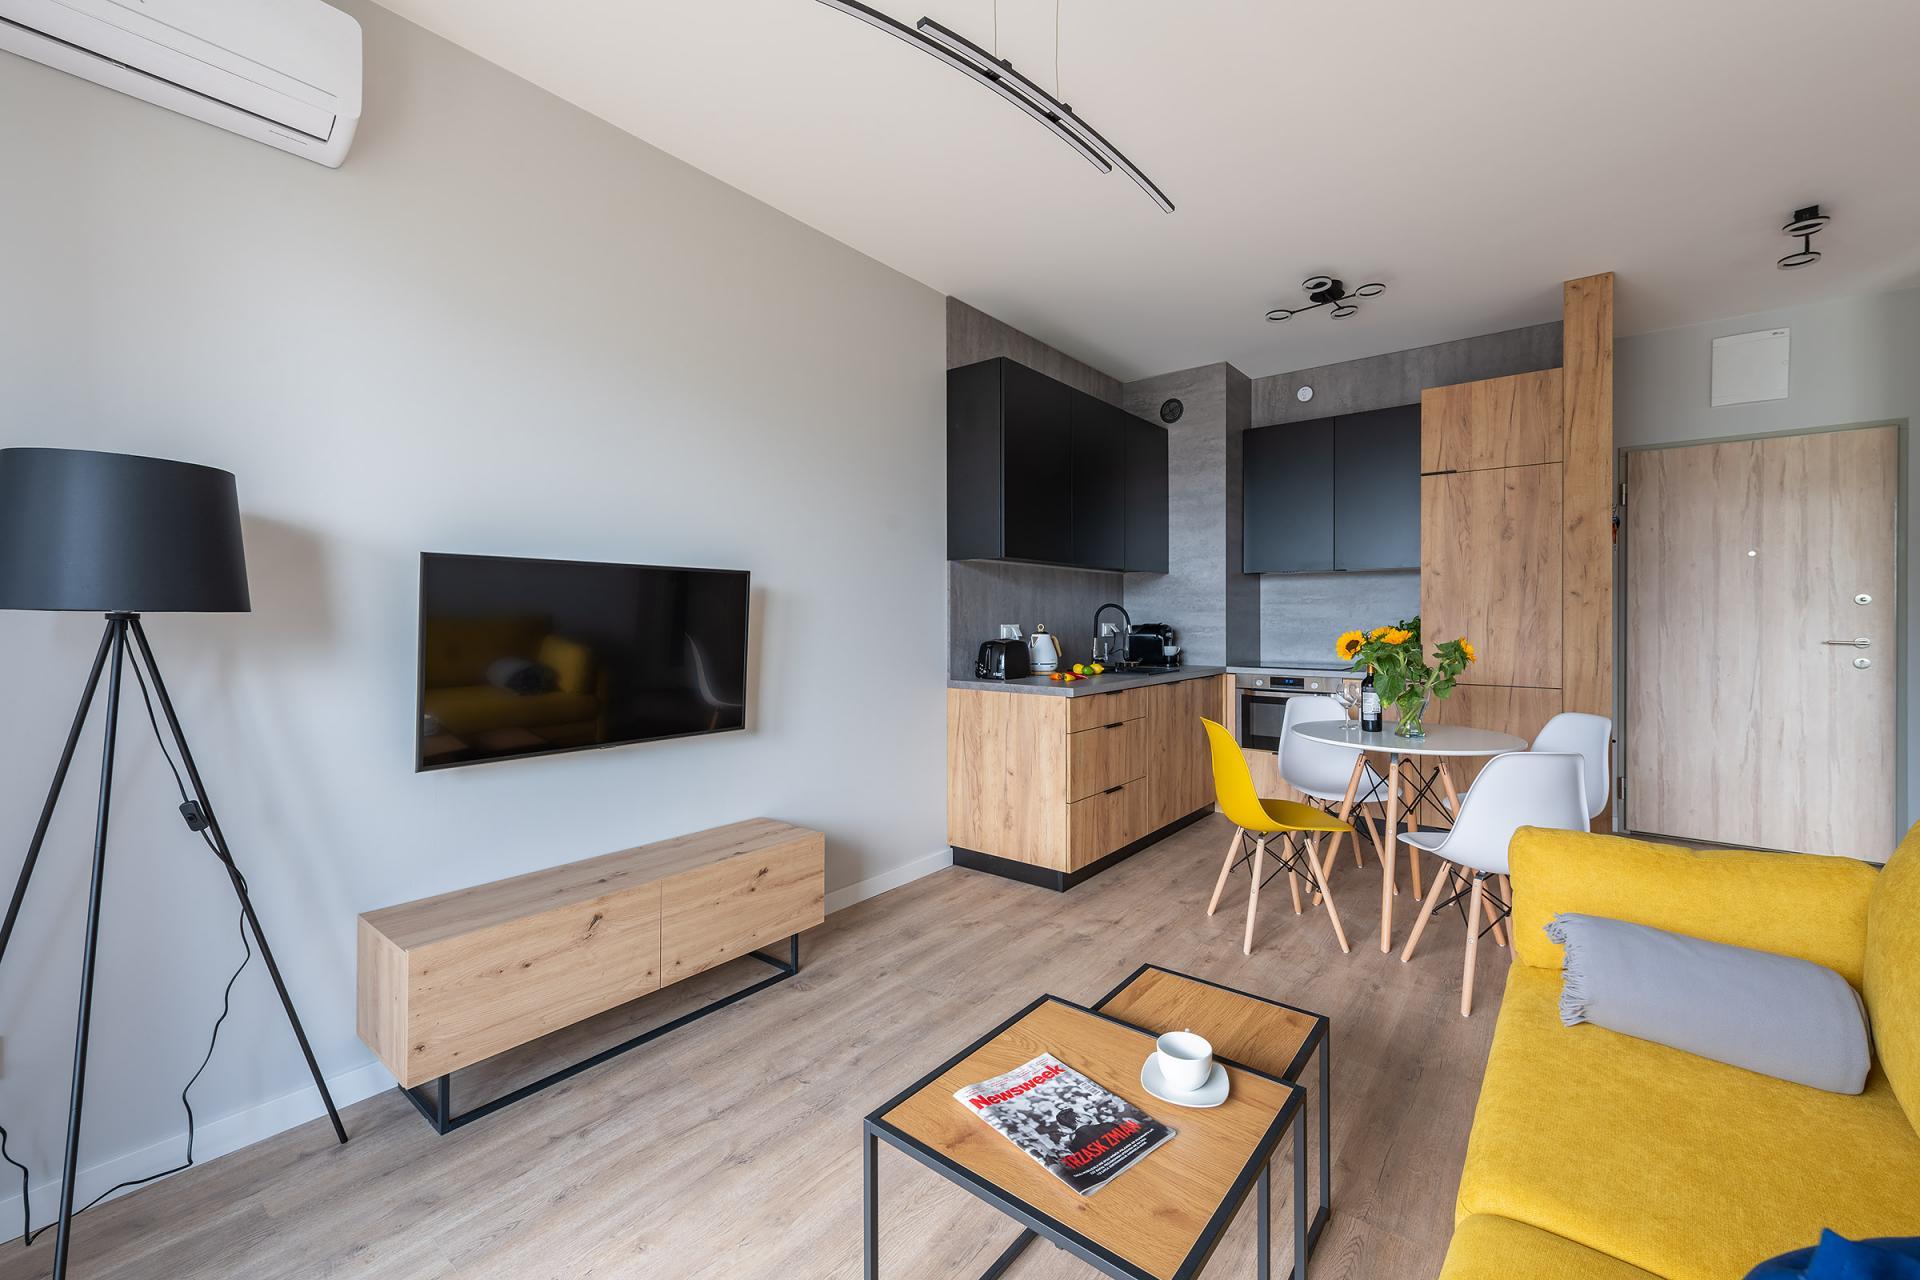 Television at Cybernetyki 4 Apartment, Sluzewiec, Warsaw